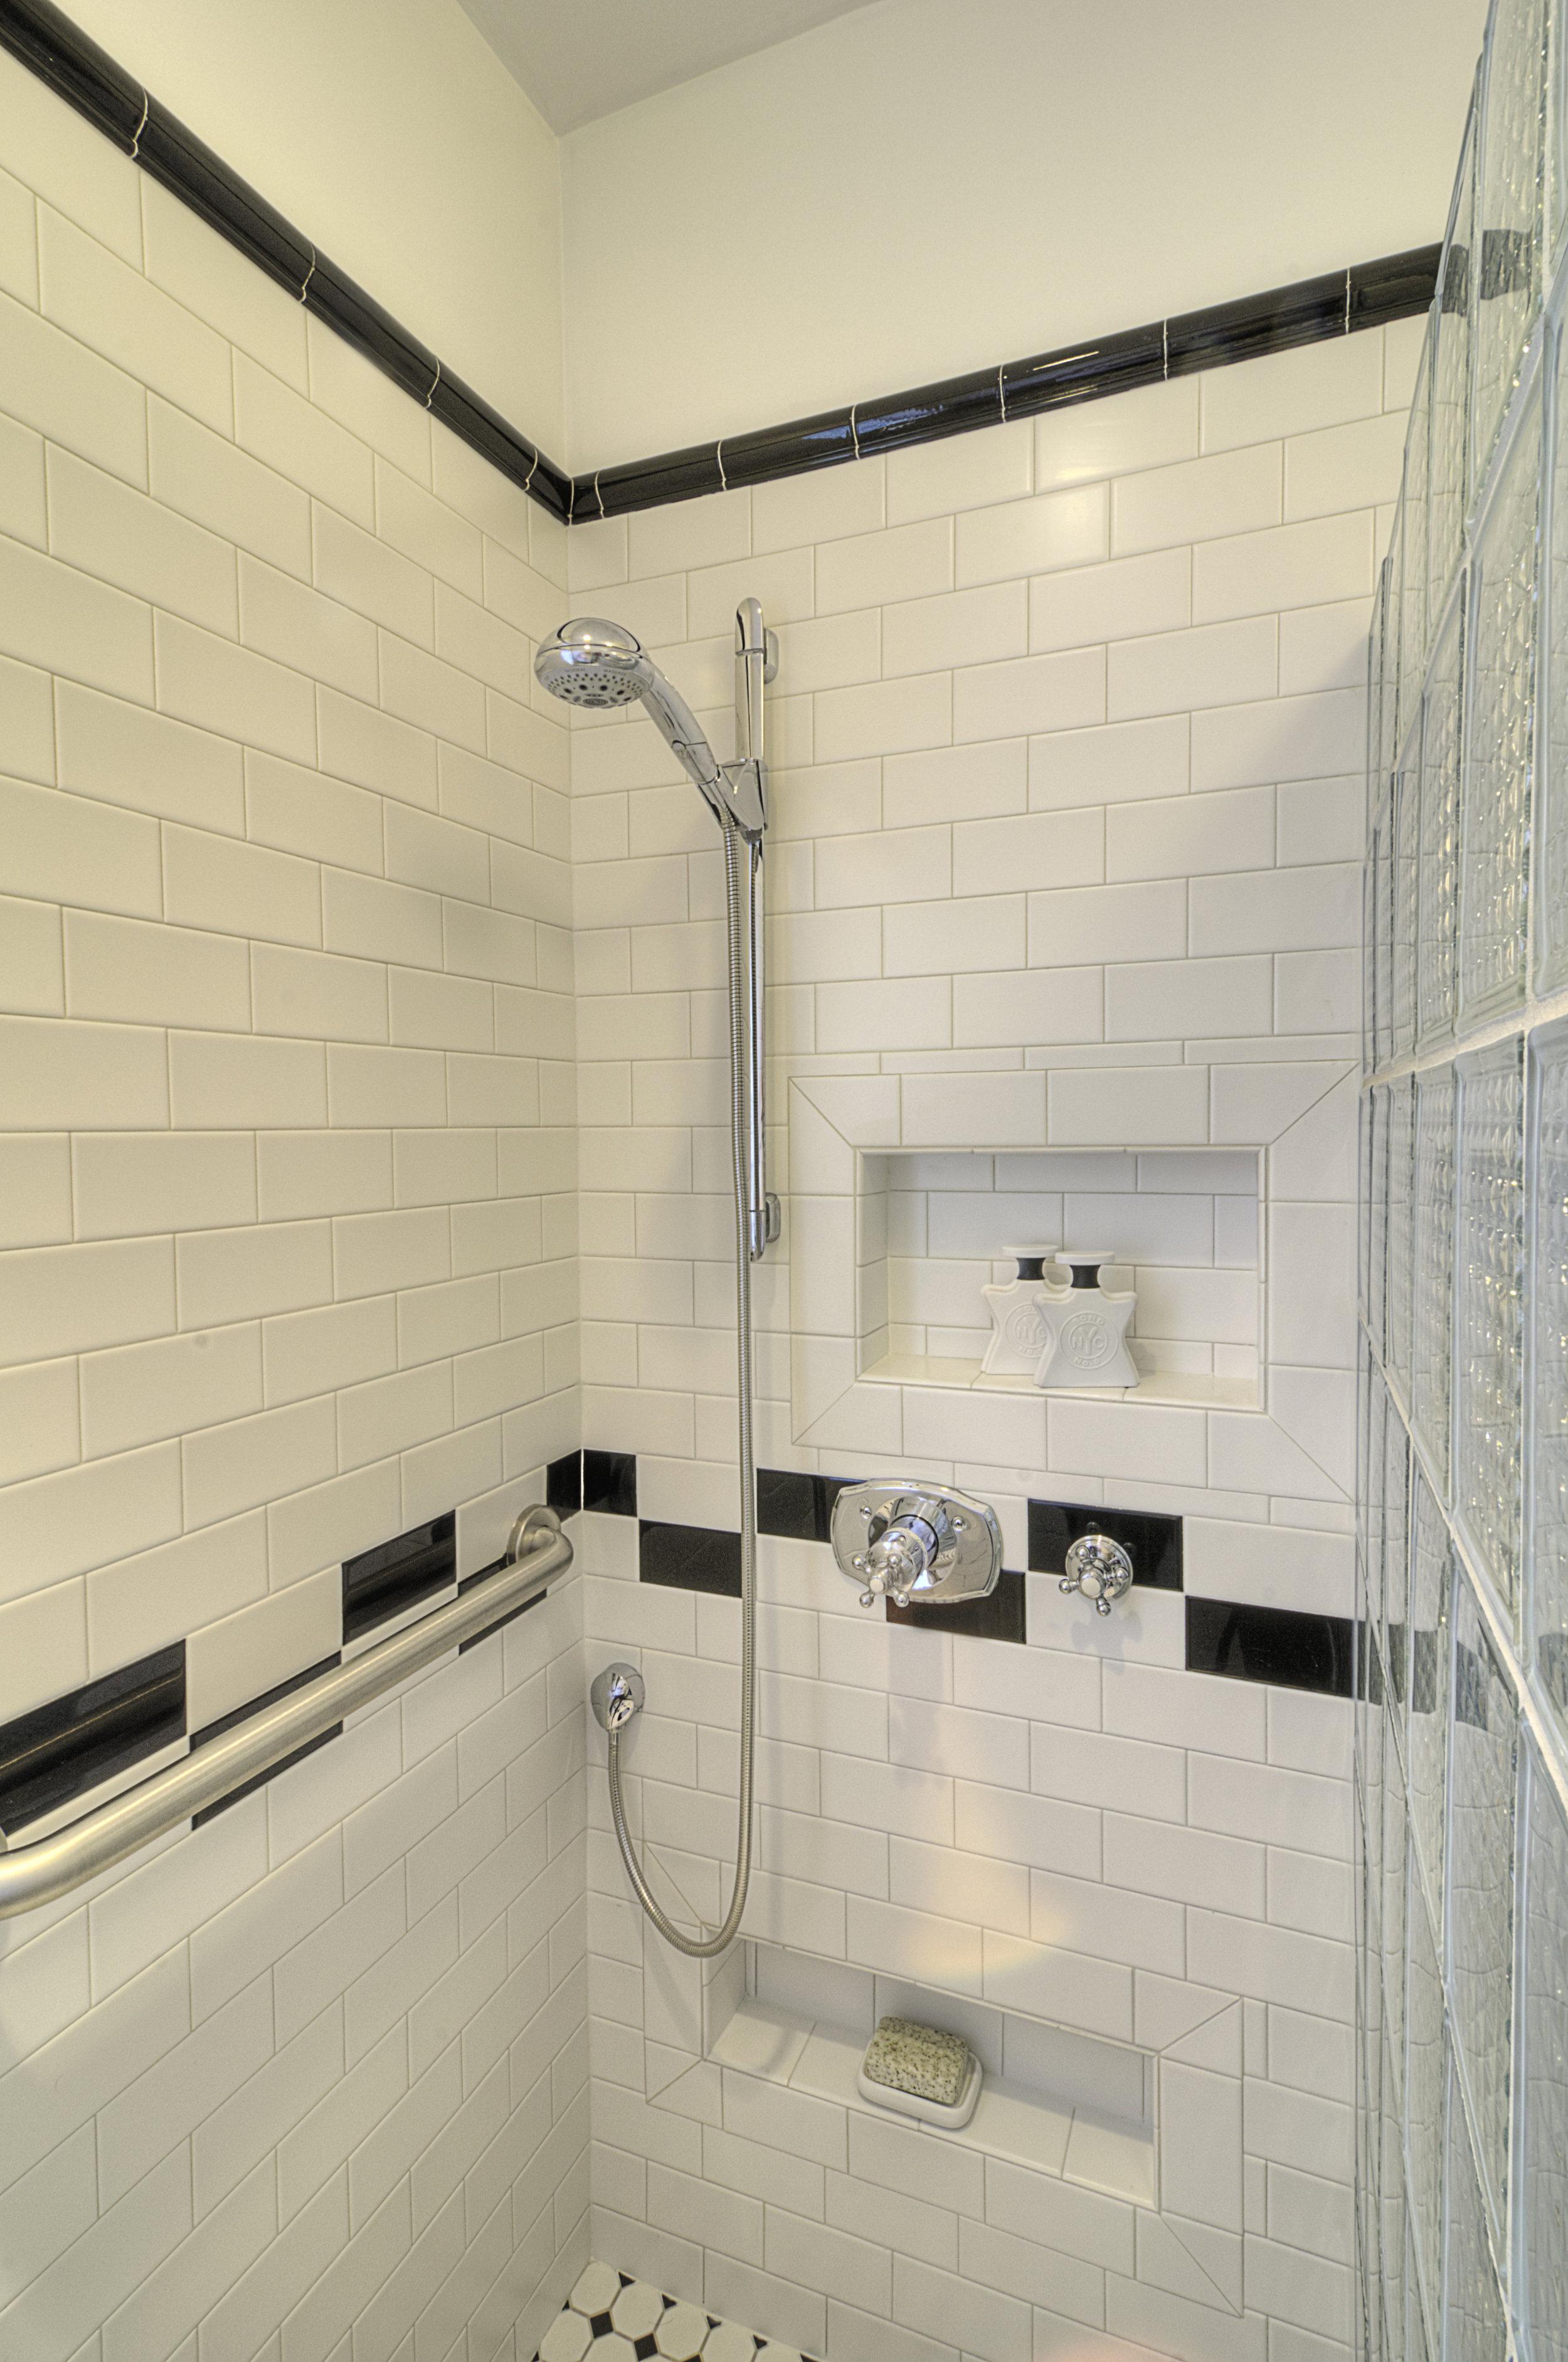 RHT Bathroom 7753 33rd Ave NW Seattle WA 98117.jpg